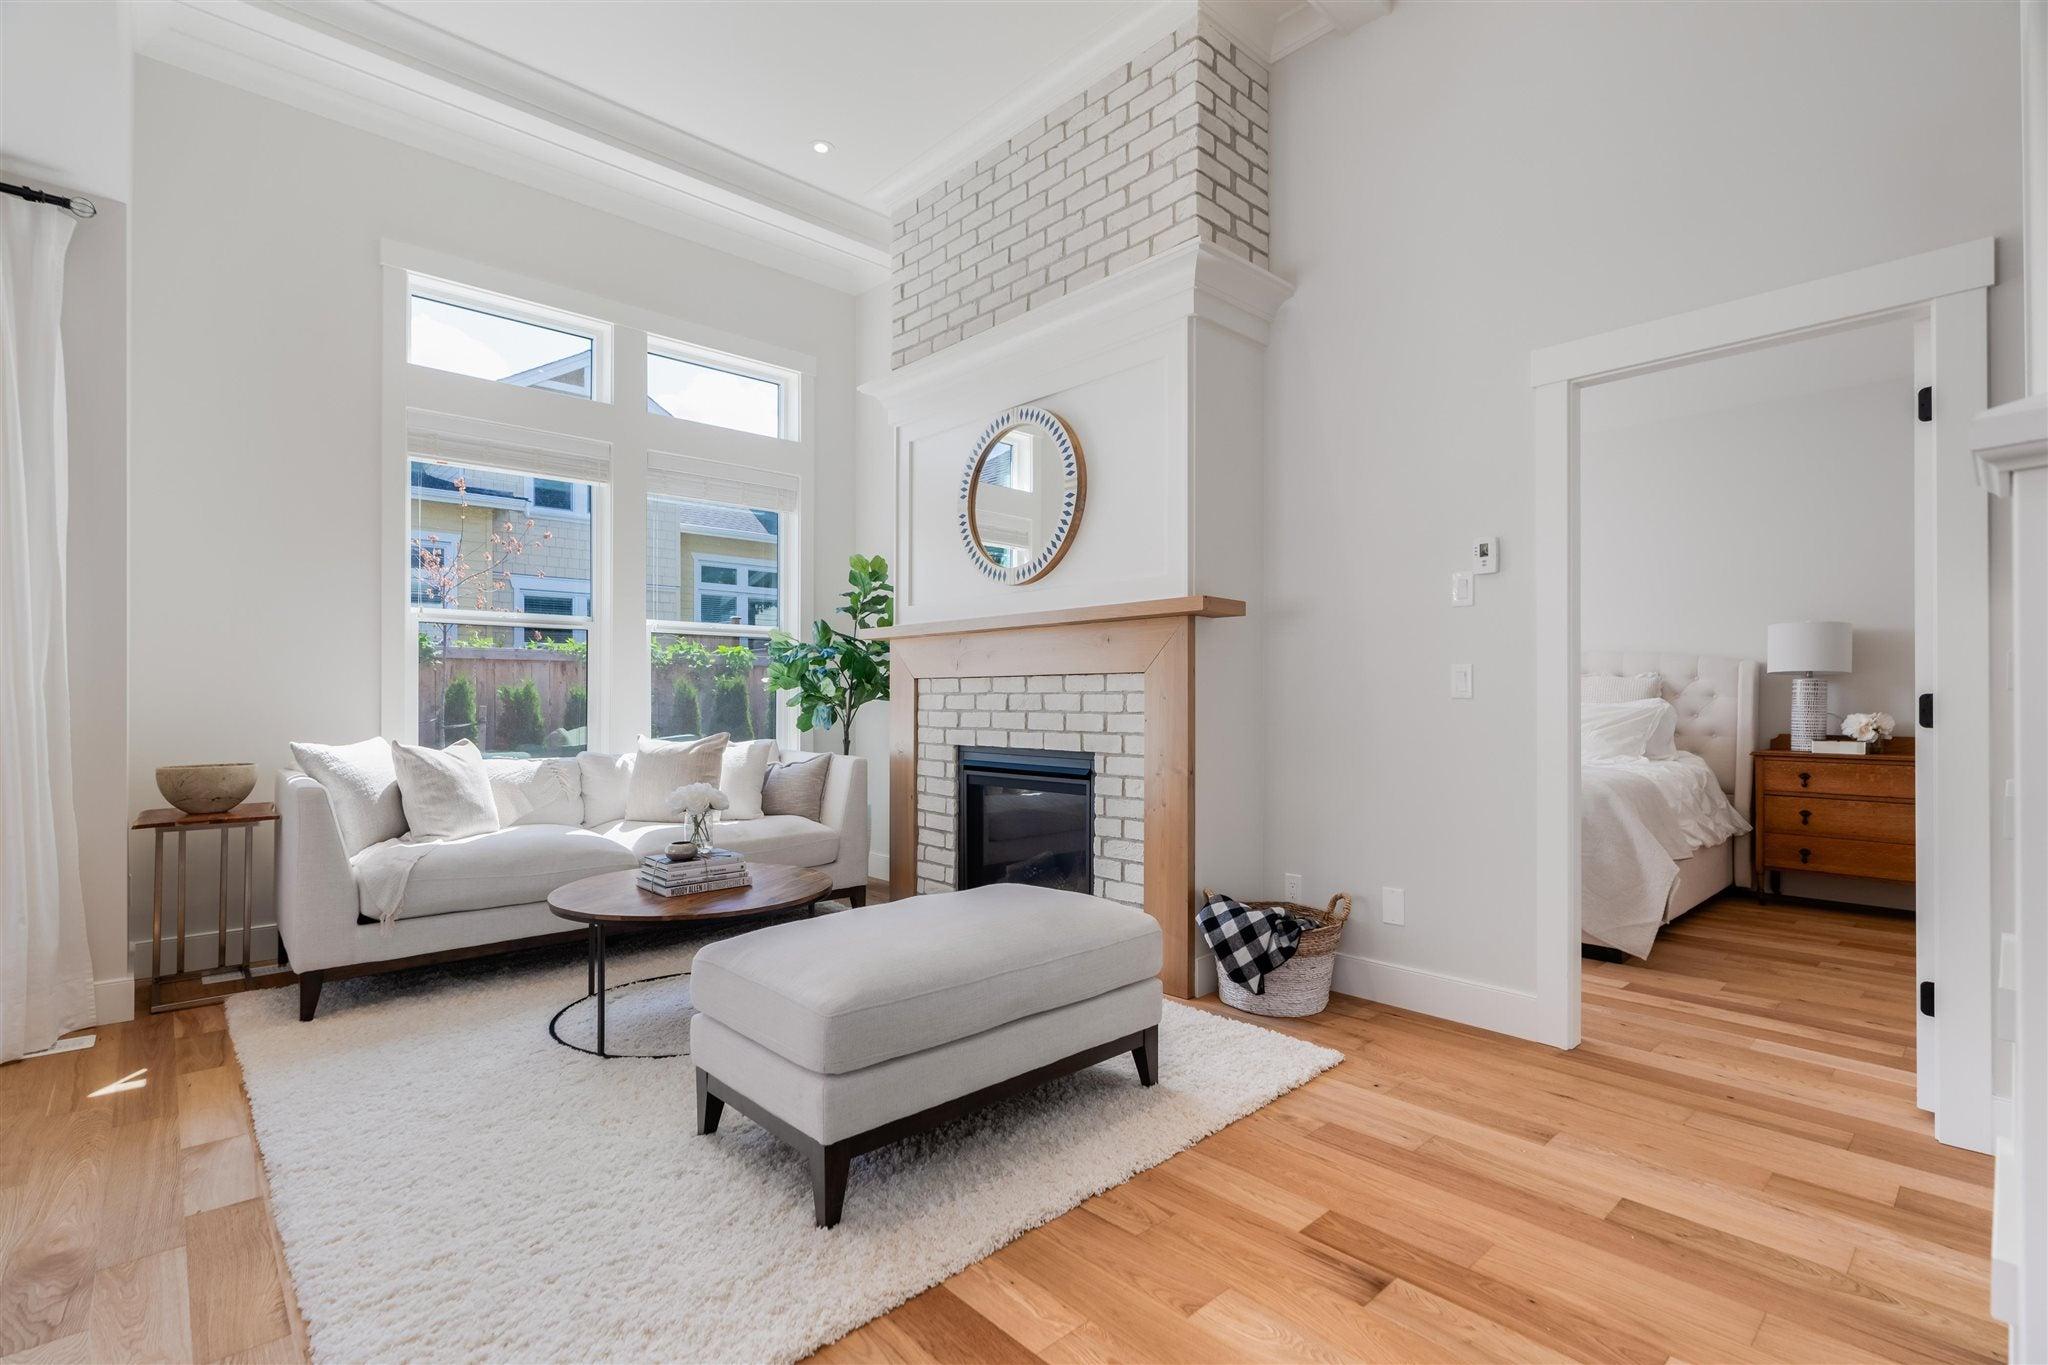 40 21858 47B AVENUE - Murrayville Townhouse for sale, 4 Bedrooms (R2603956) - #3